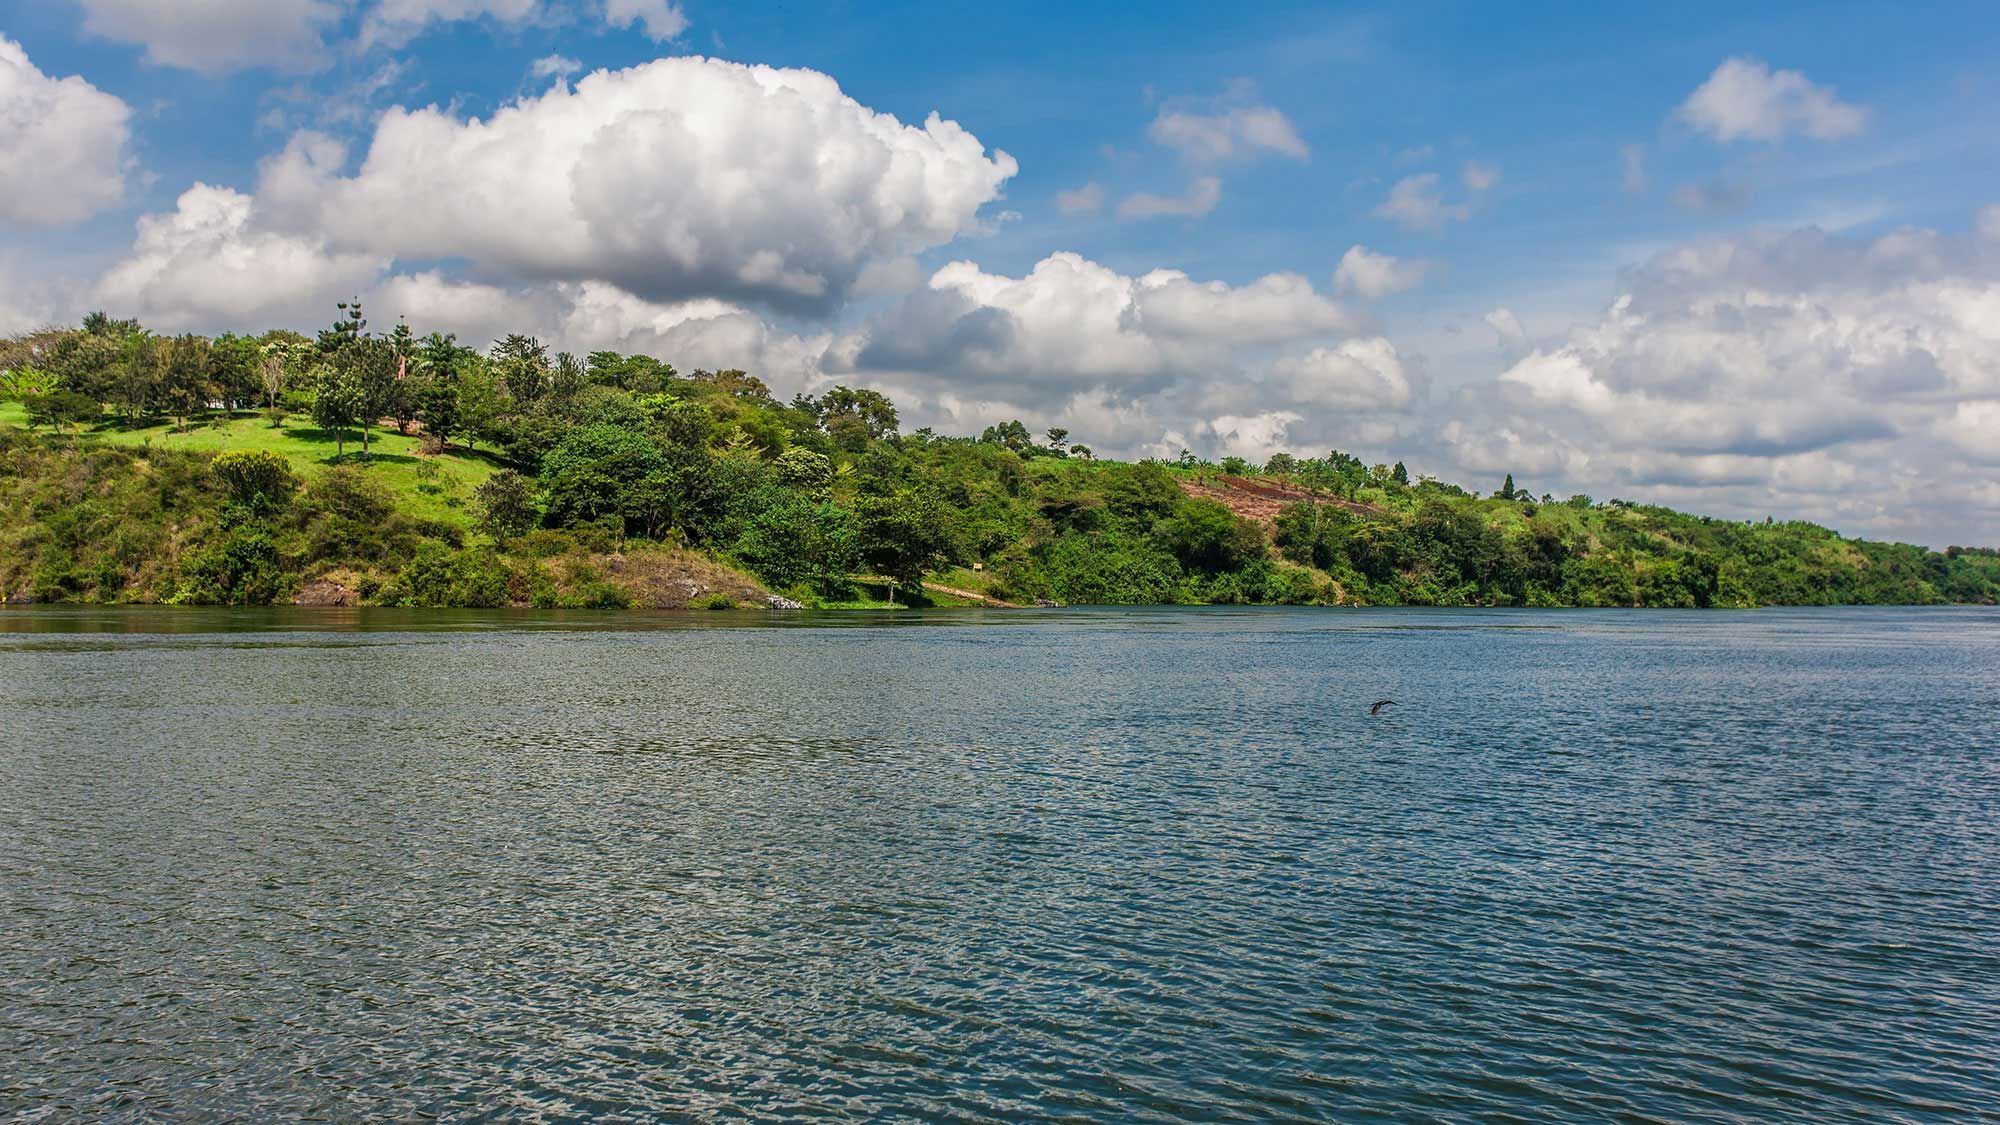 River Nile leaving Lake Victoria at Jinja Uganda Africa